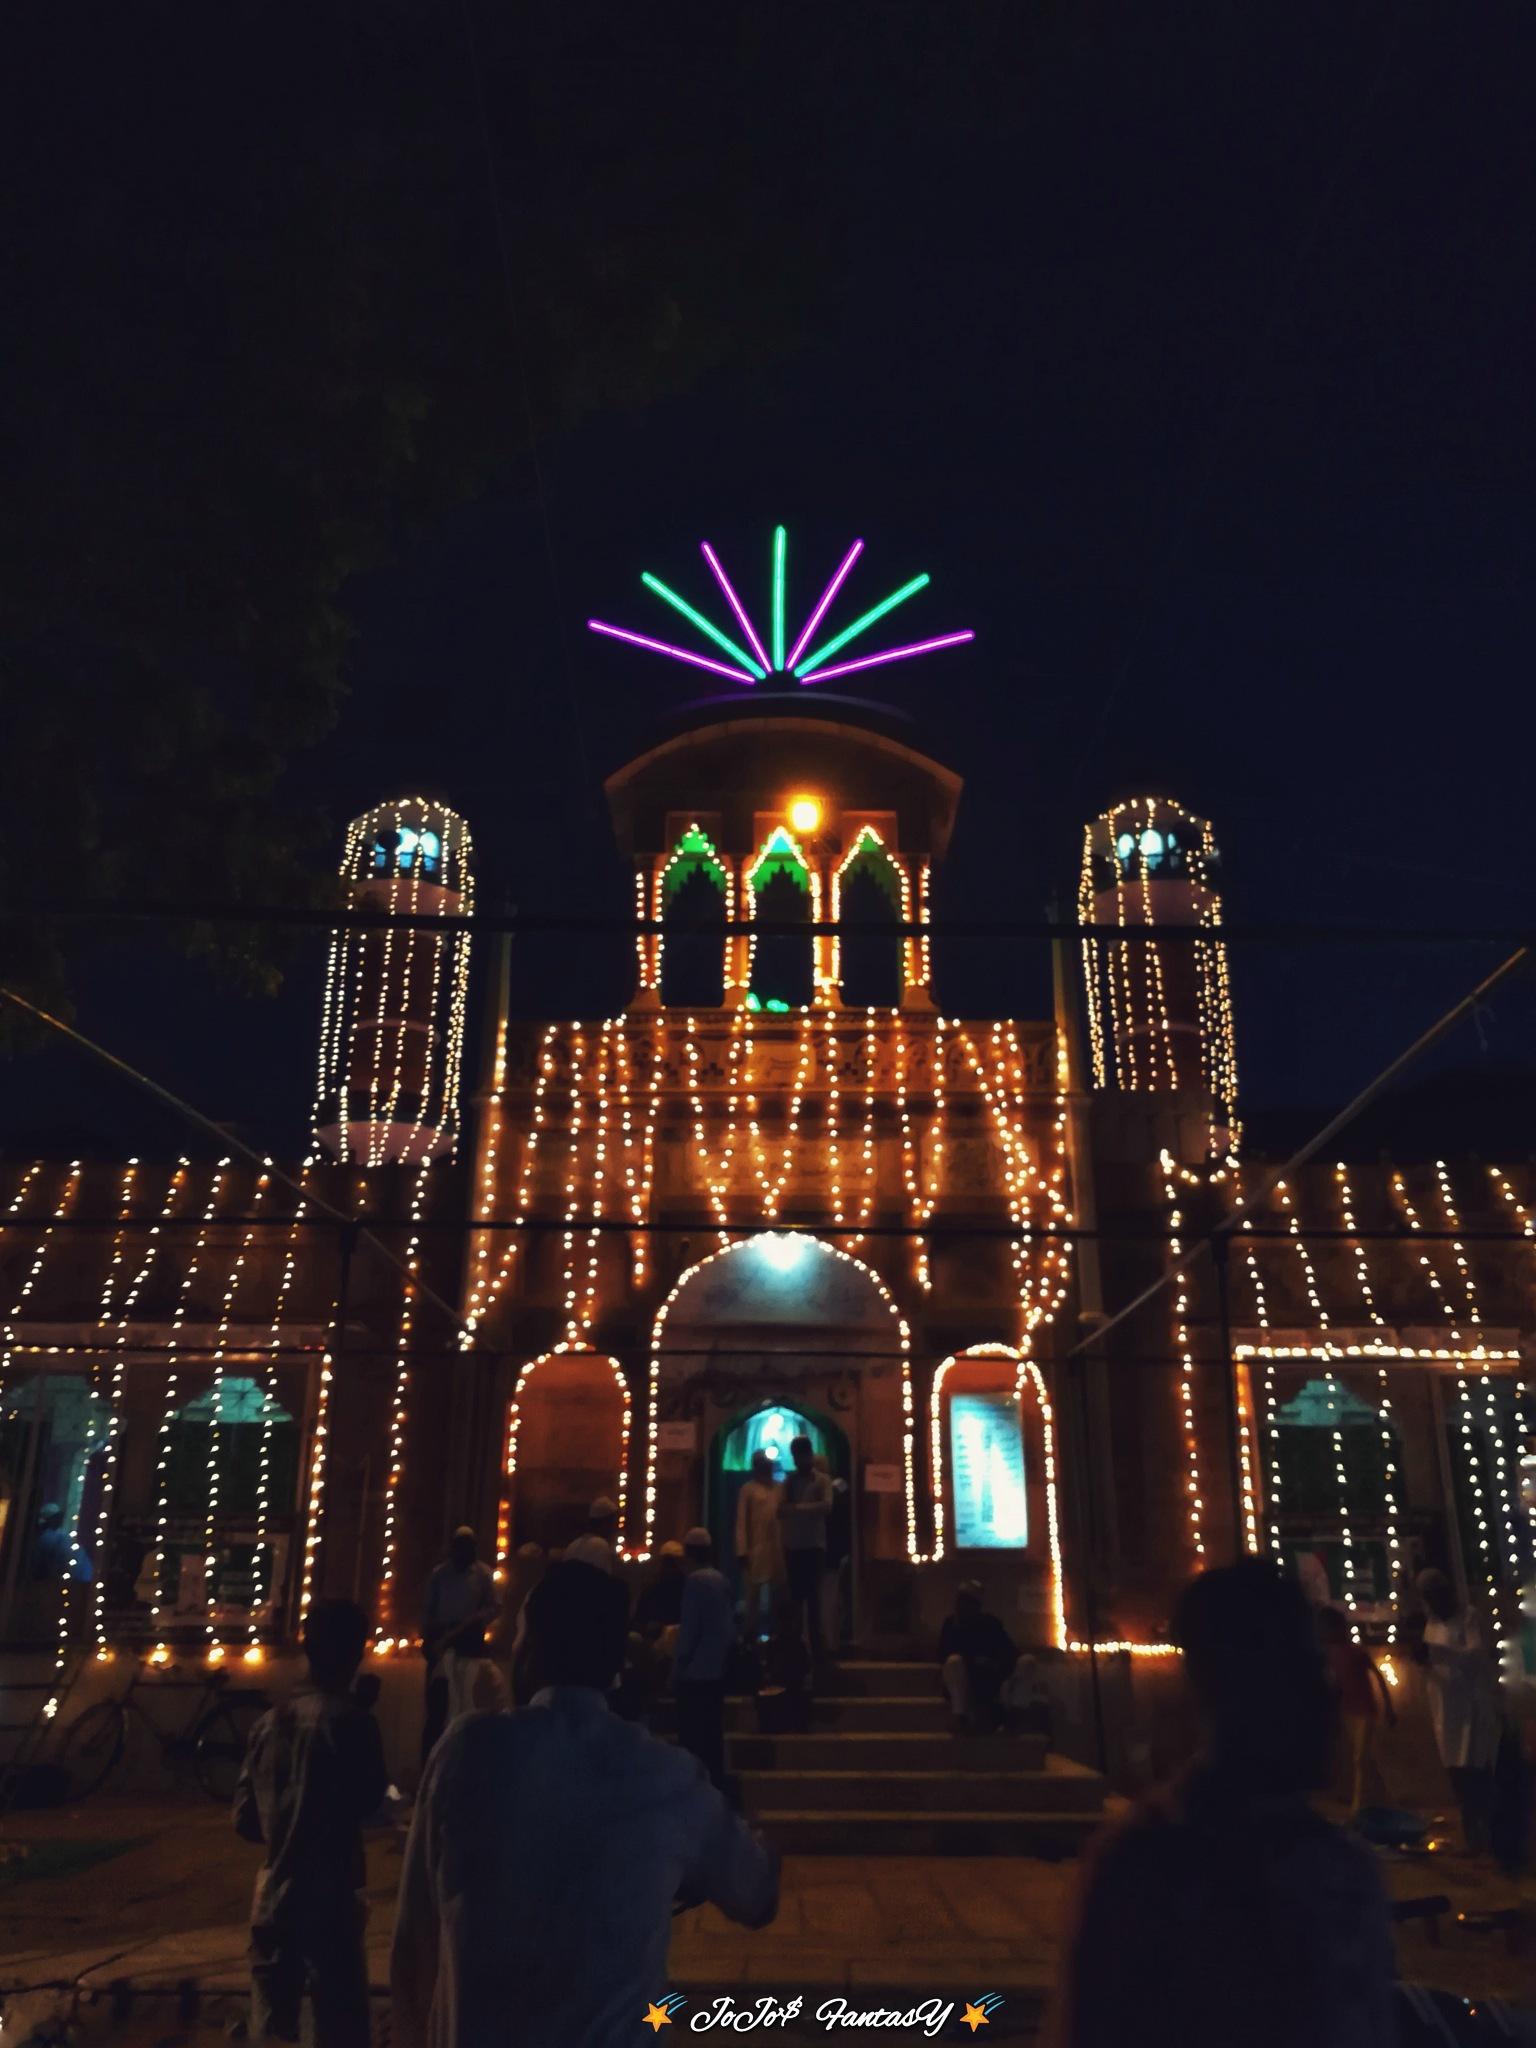 mosque at night by lijojose185